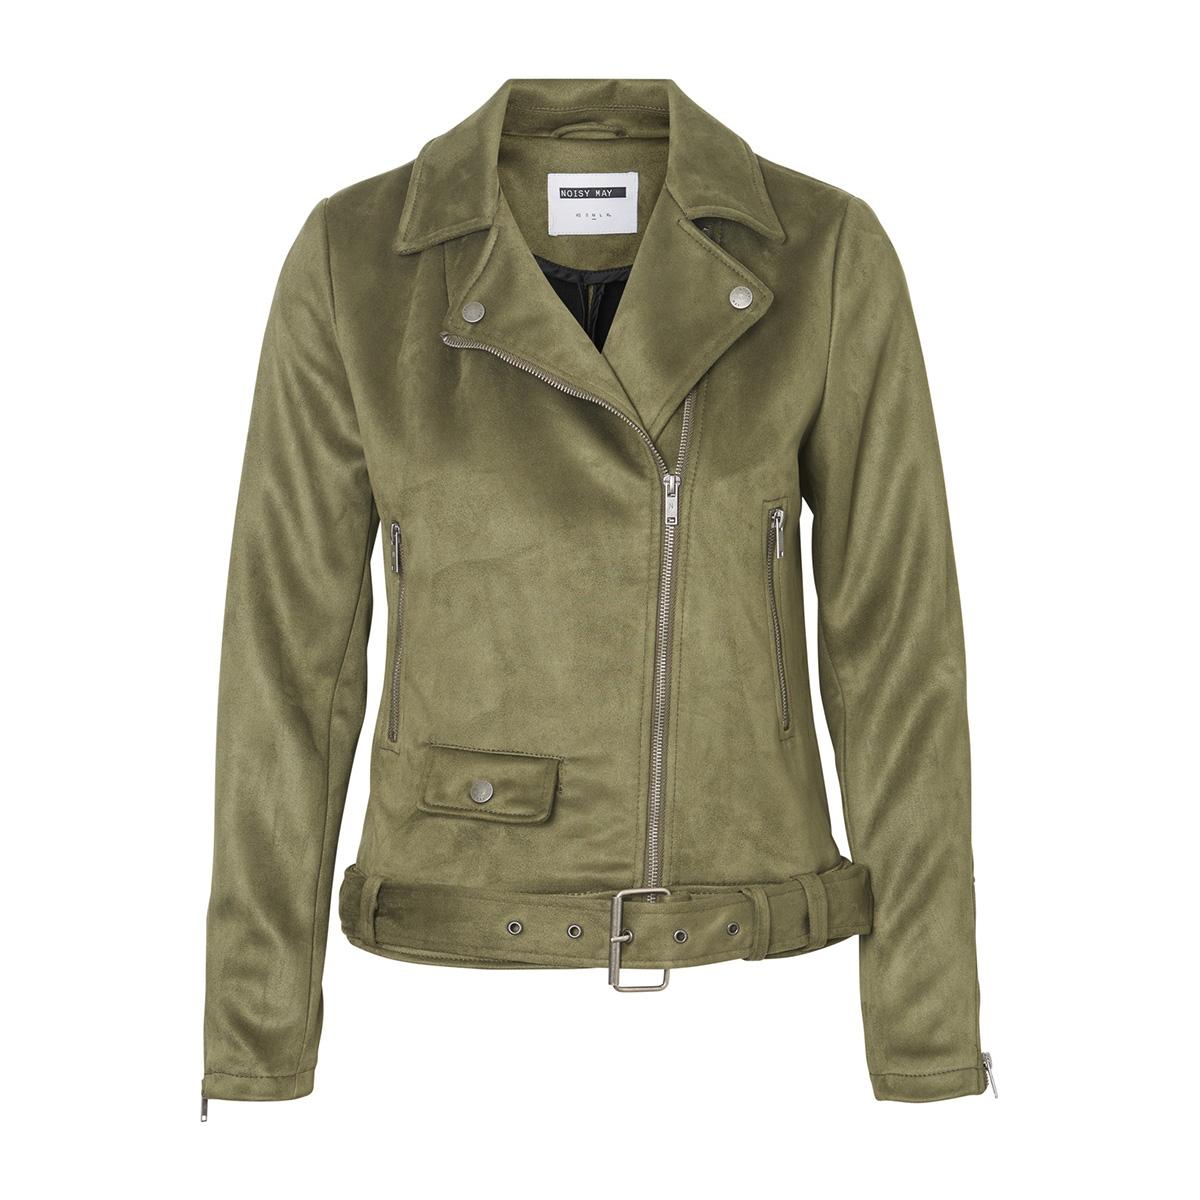 nmchrizzy l/s jacket clr 27005950 noisy may jas olive night